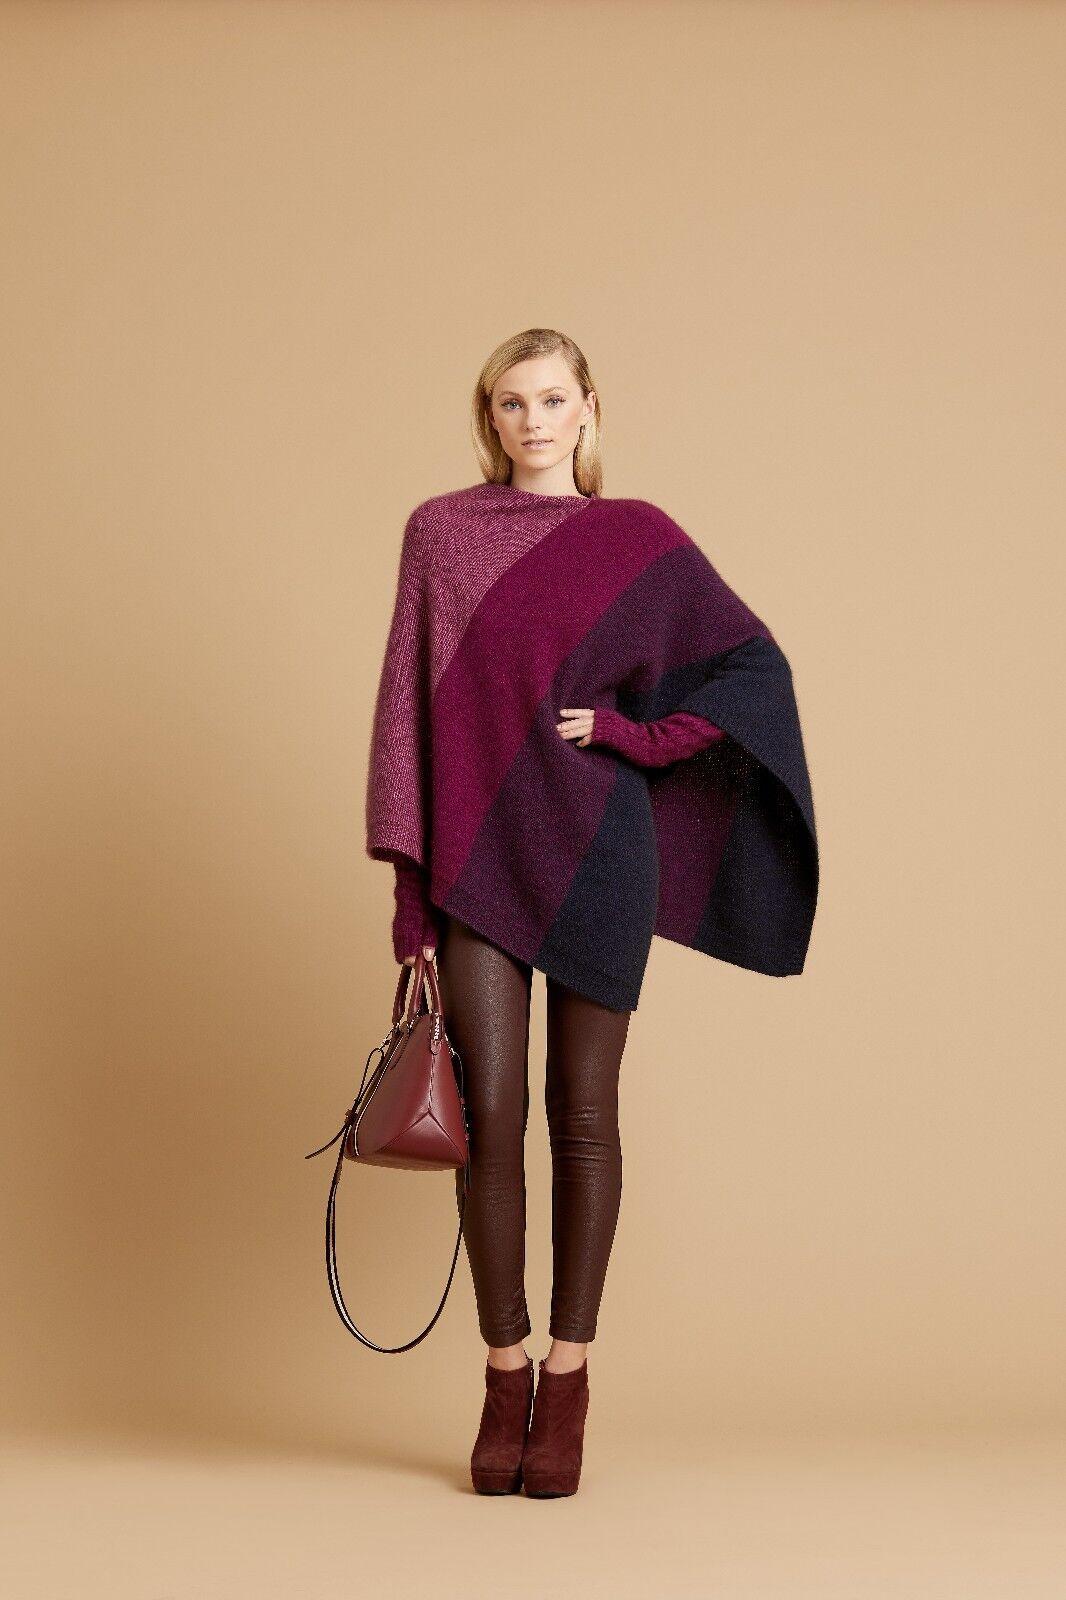 New Zealand Possum Merino Wool Knitwear Ombre Poncho